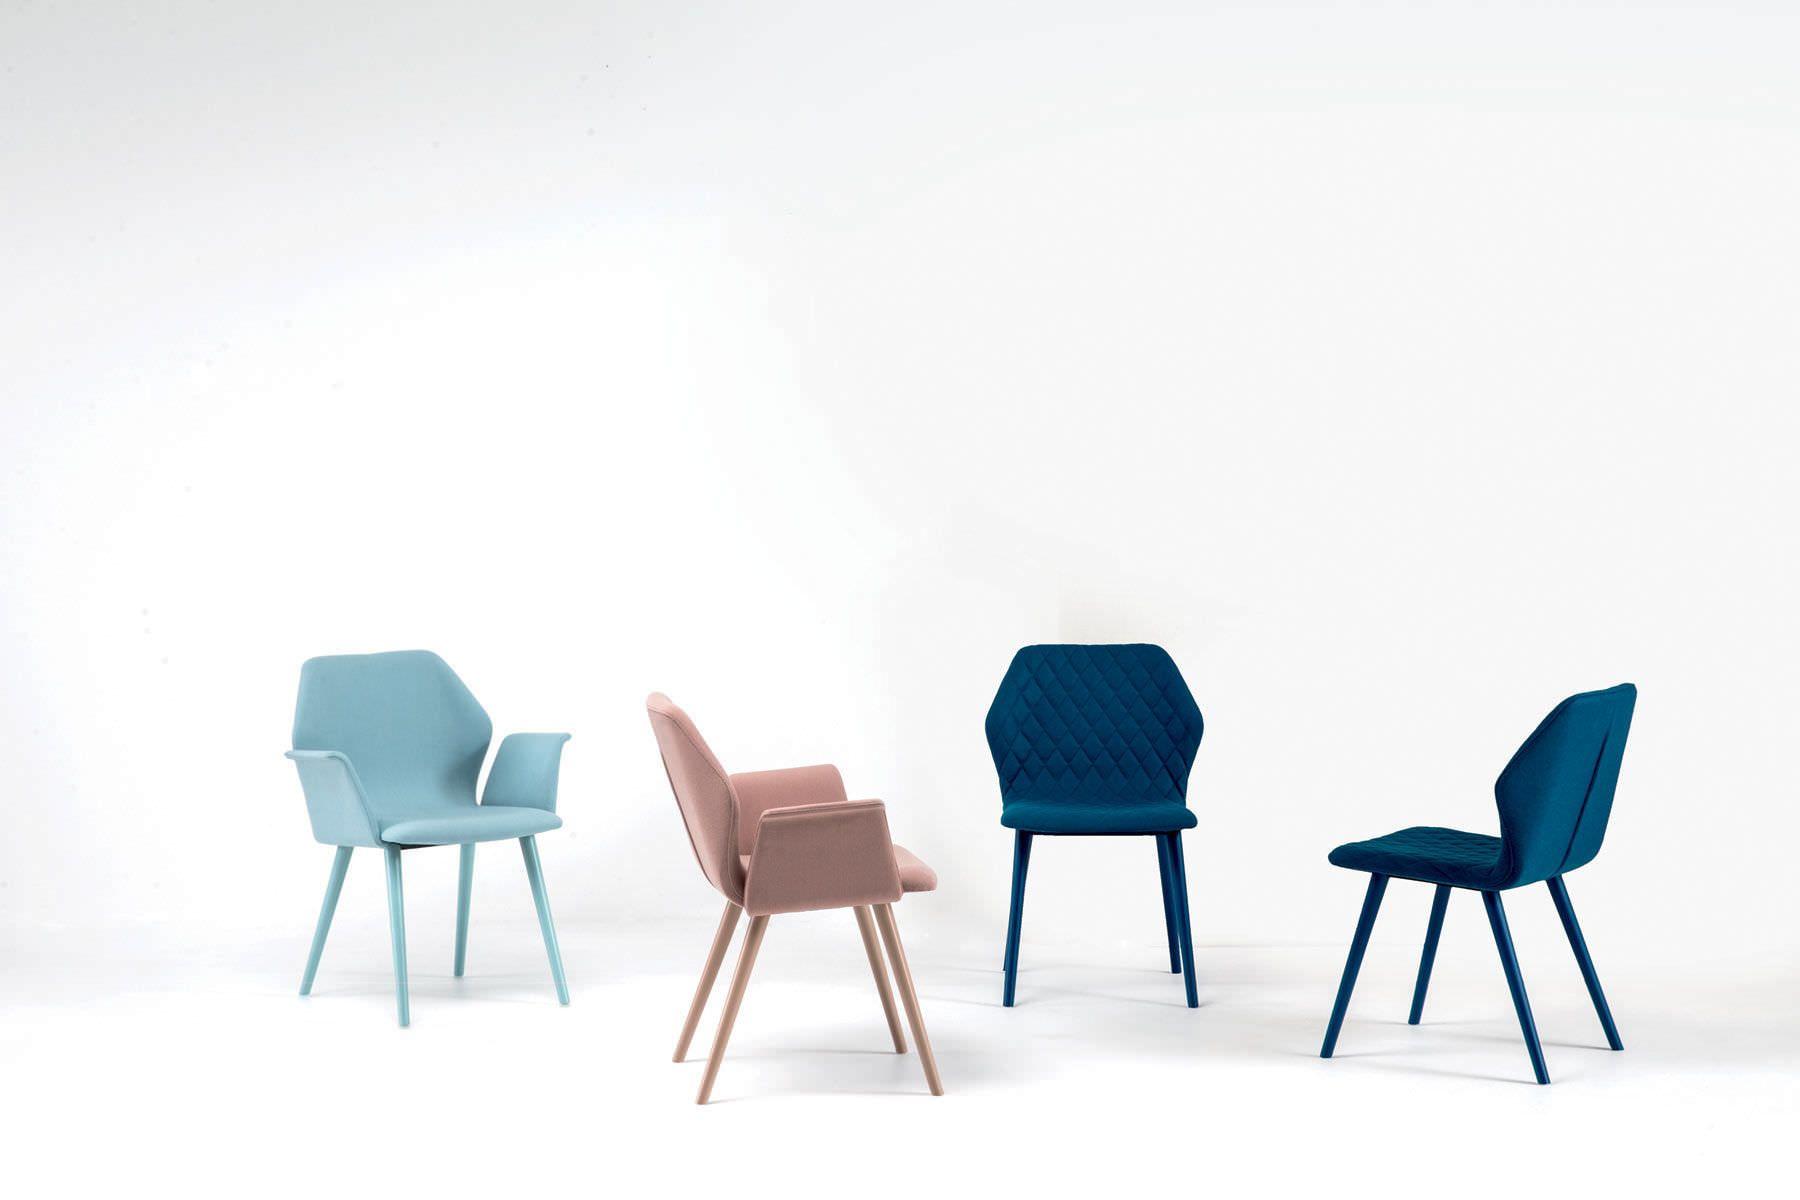 Chaise Contemporaine Avec Accoudoirs En Tissu En Cuir Ava By Michael Schmidt Bross Dining Chairs Contemporary Dining Chair Design Contemporary Chairs